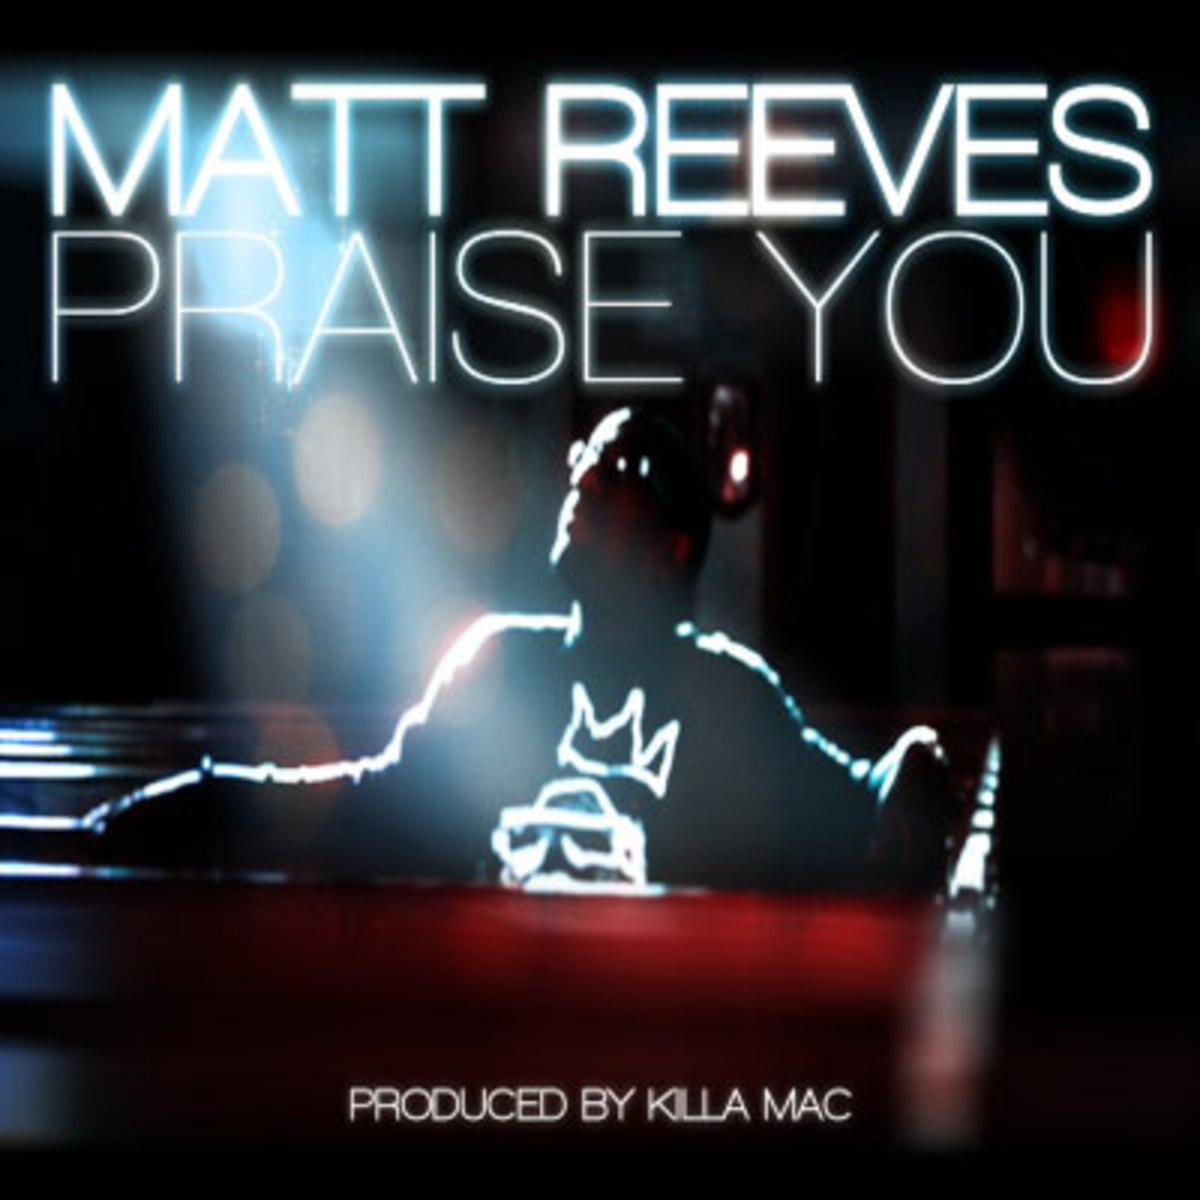 mattreeves-praiseyou.jpg